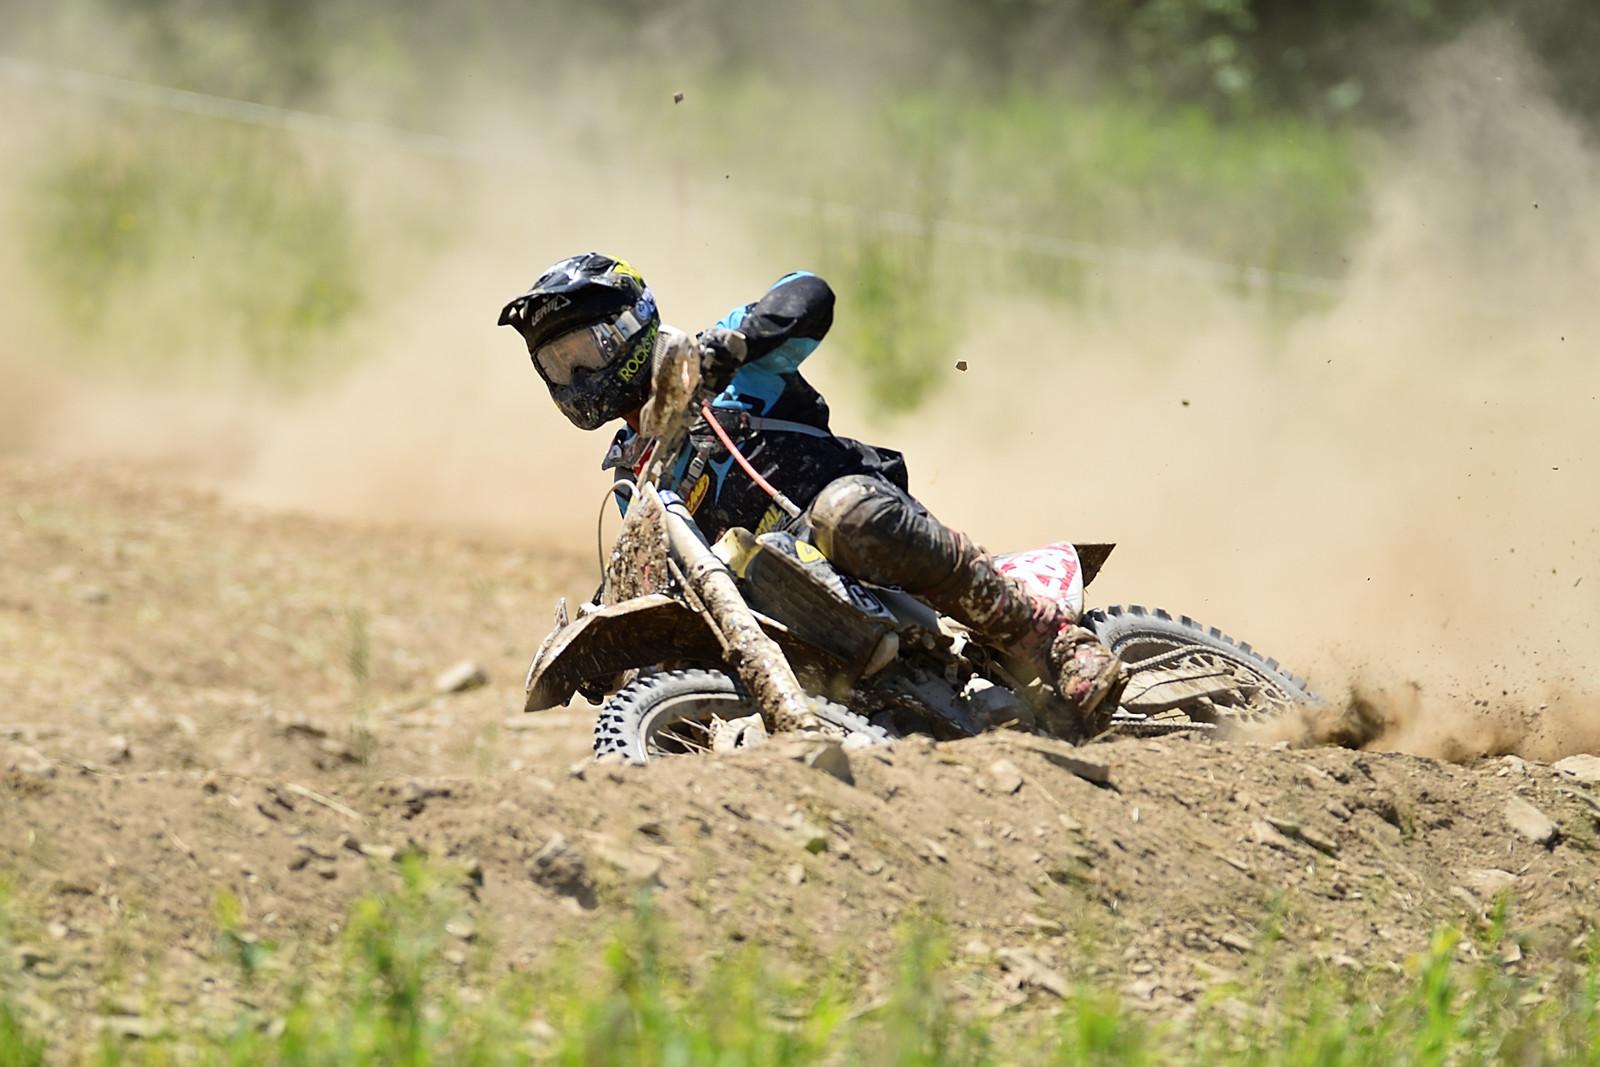 Ryan Sipes - Tomahawk GNCC - Motocross Pictures - Vital MX